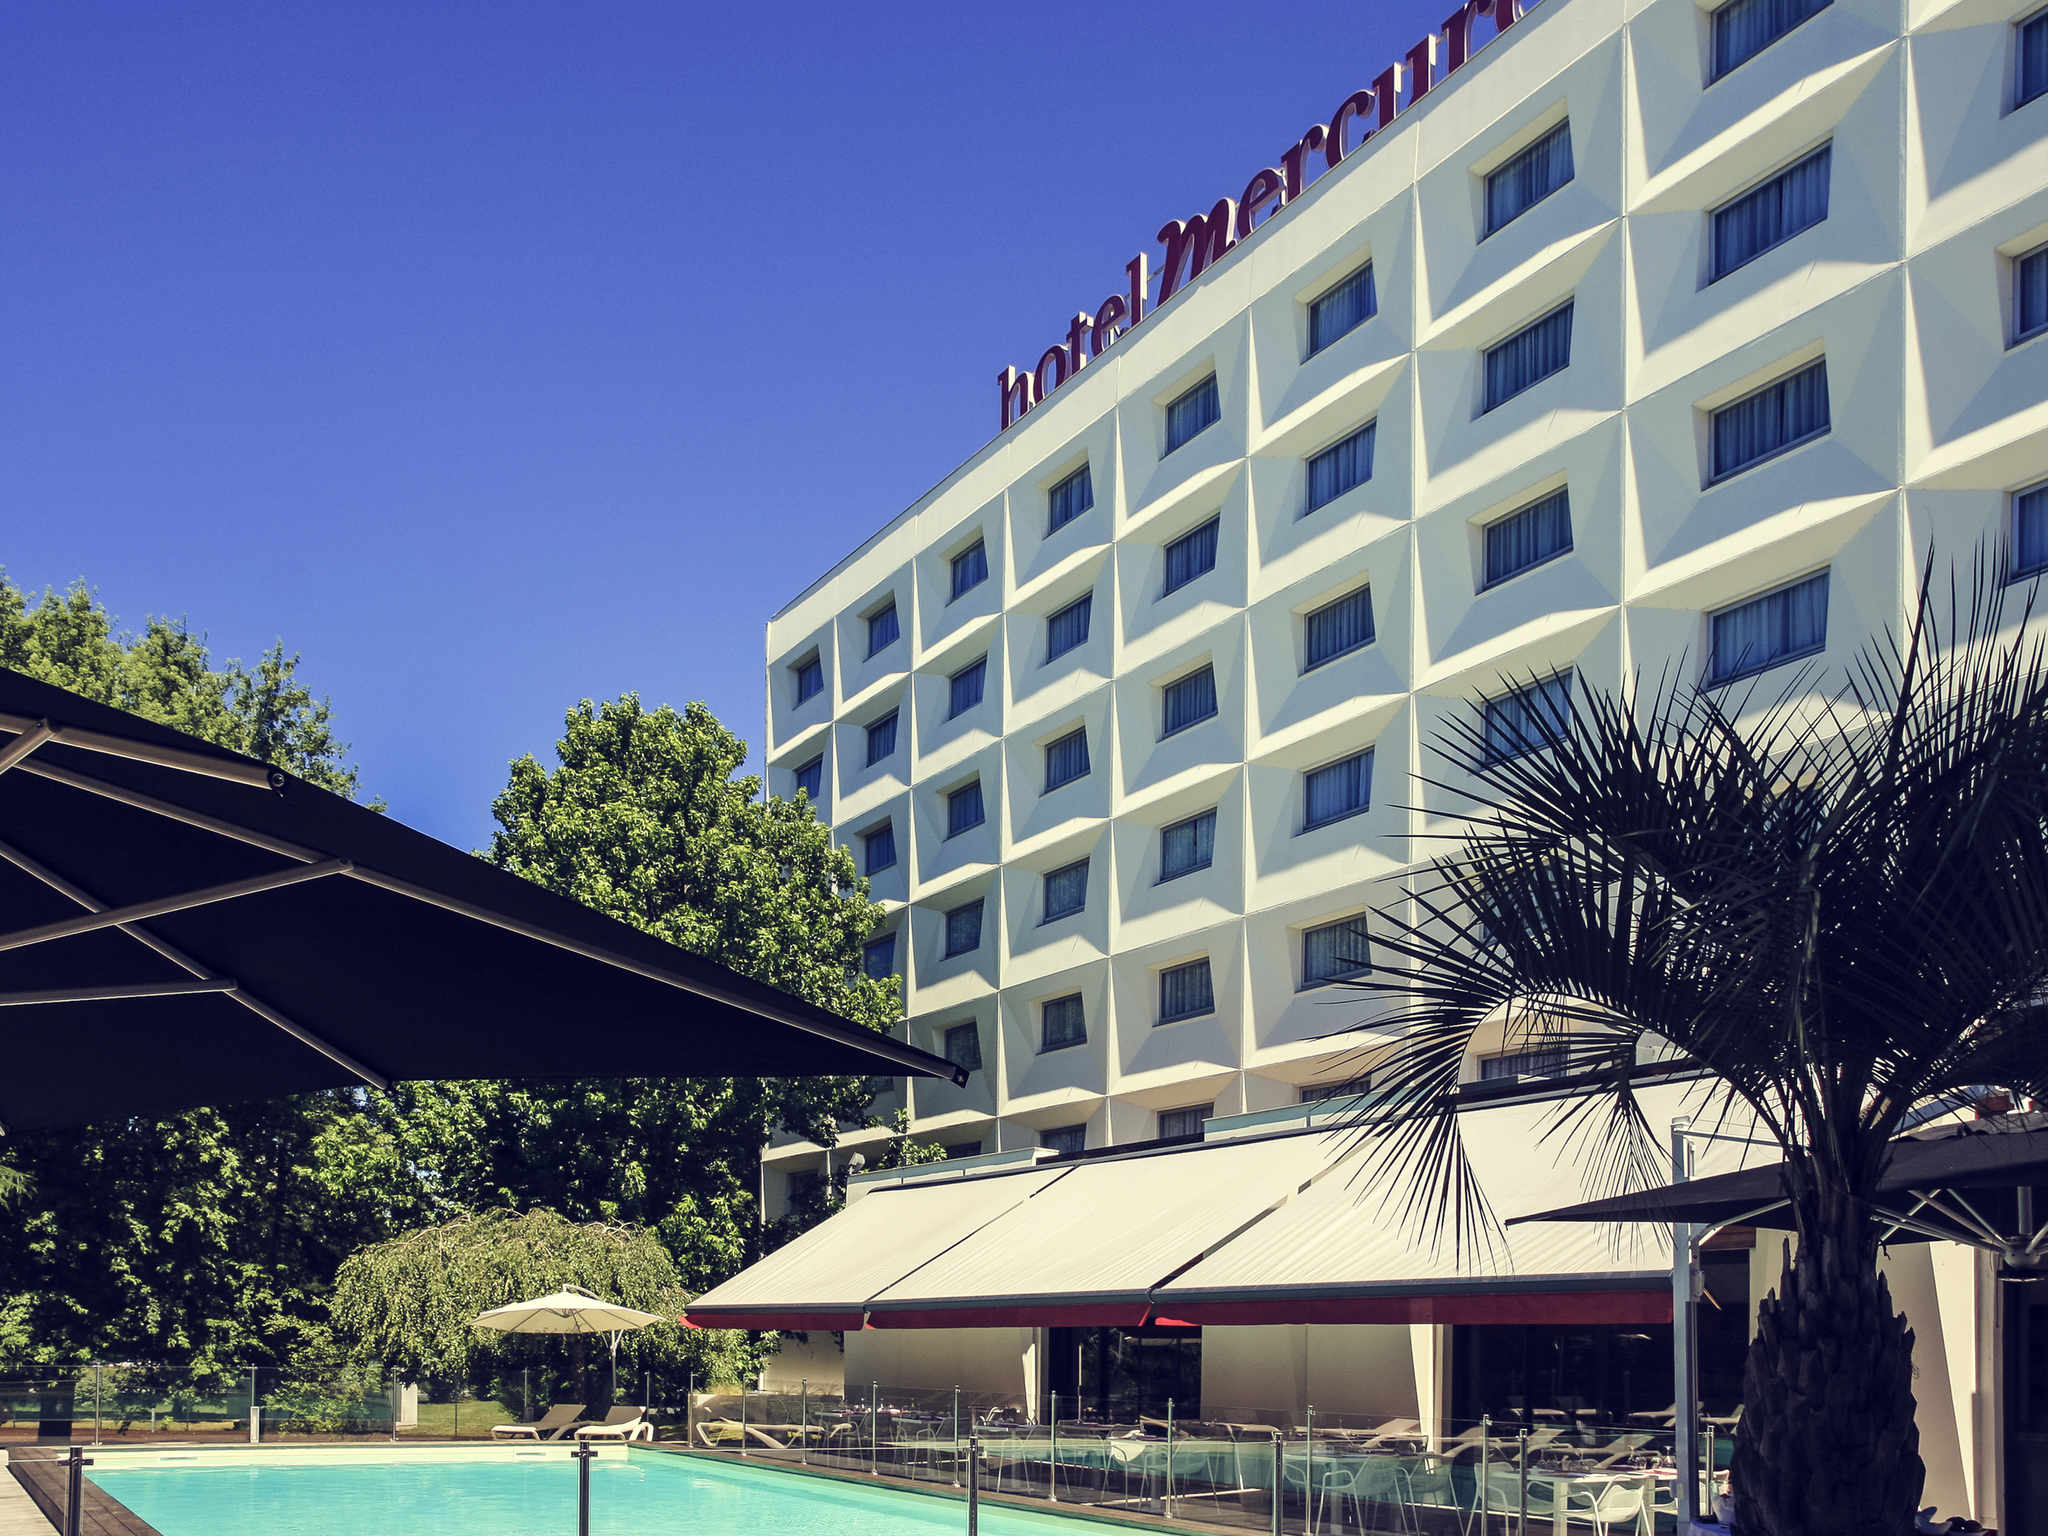 Hotel – Hotel Mercure Bordeaux Lac